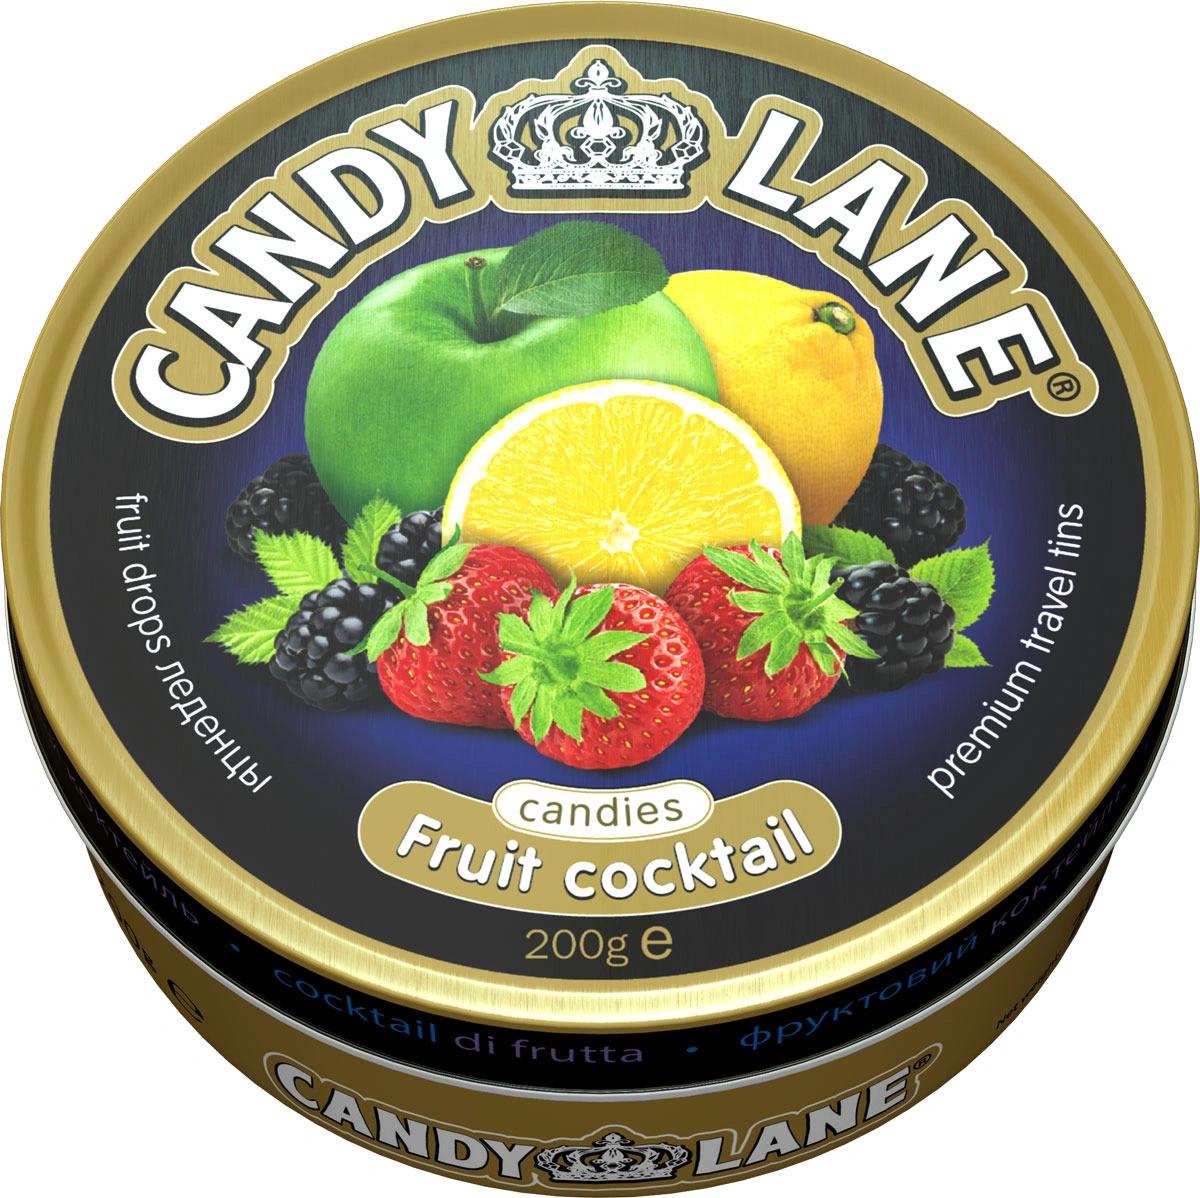 Леденцы CANDY Lane  фруктовые ягодные ж/б 200 гр.